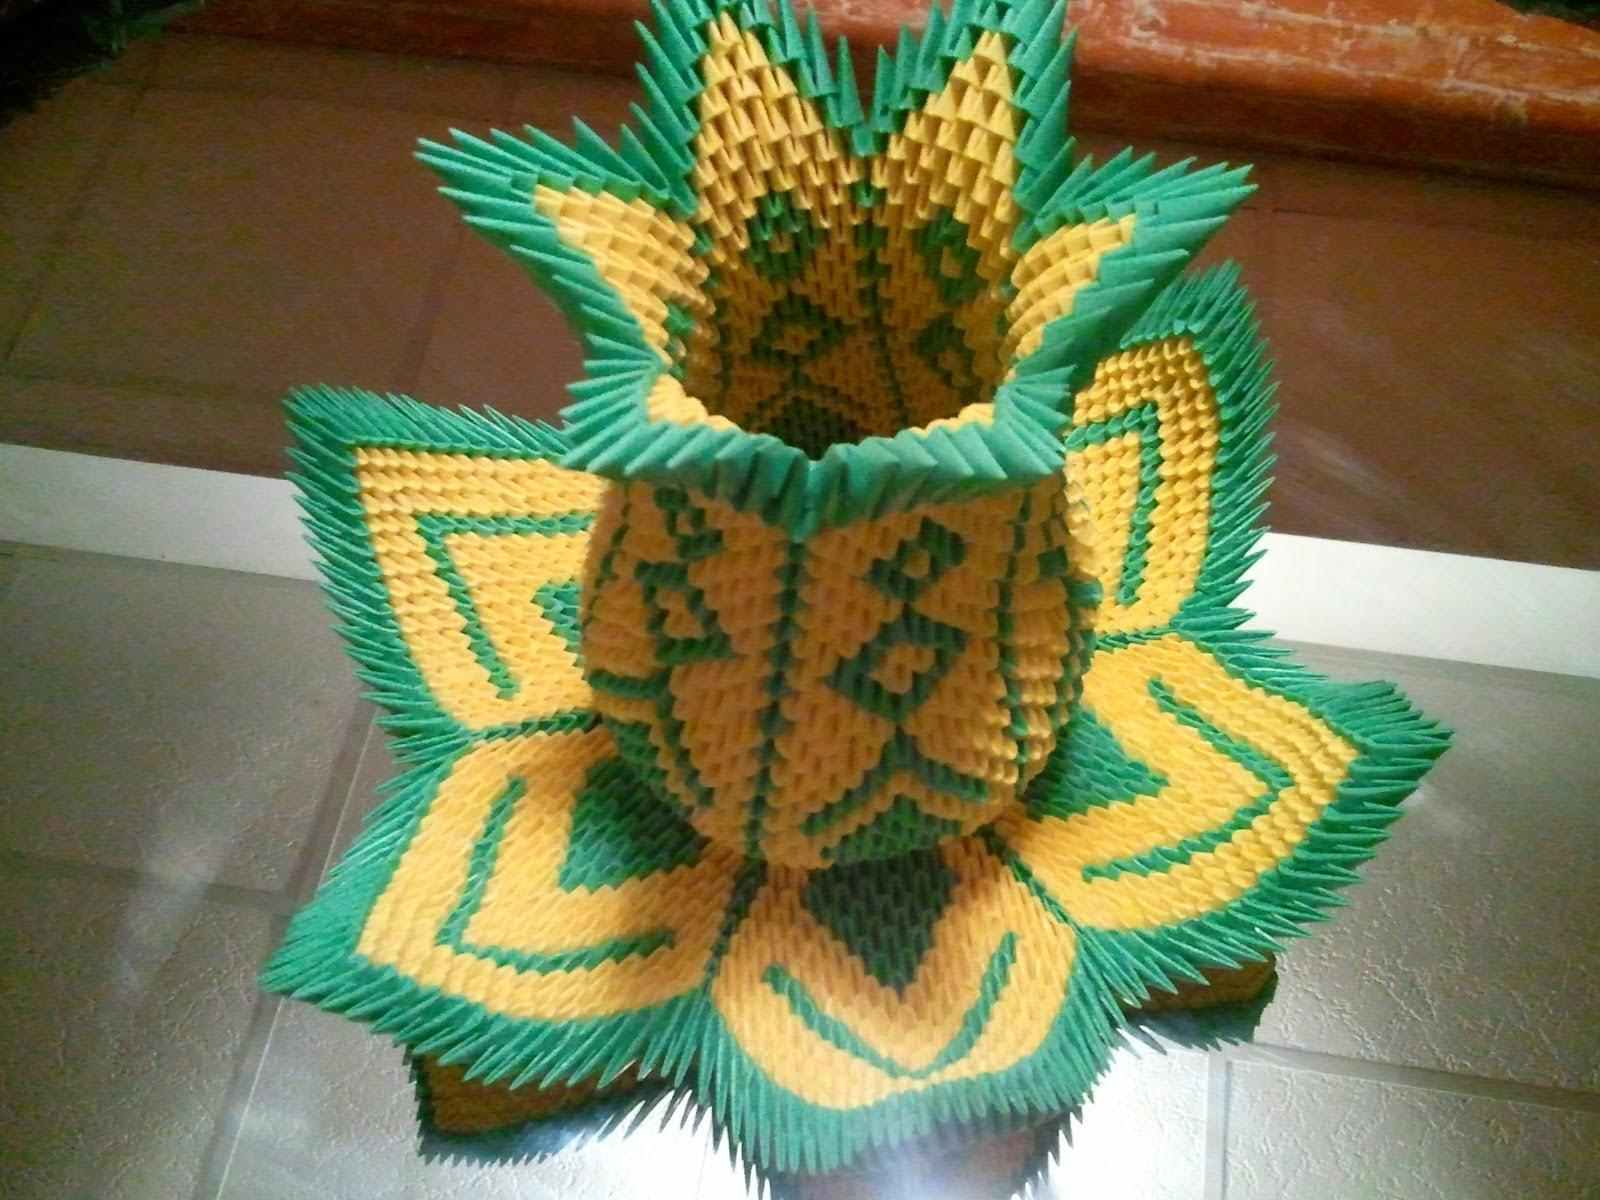 3d Origami Vase Kids Origami Instructions Easy